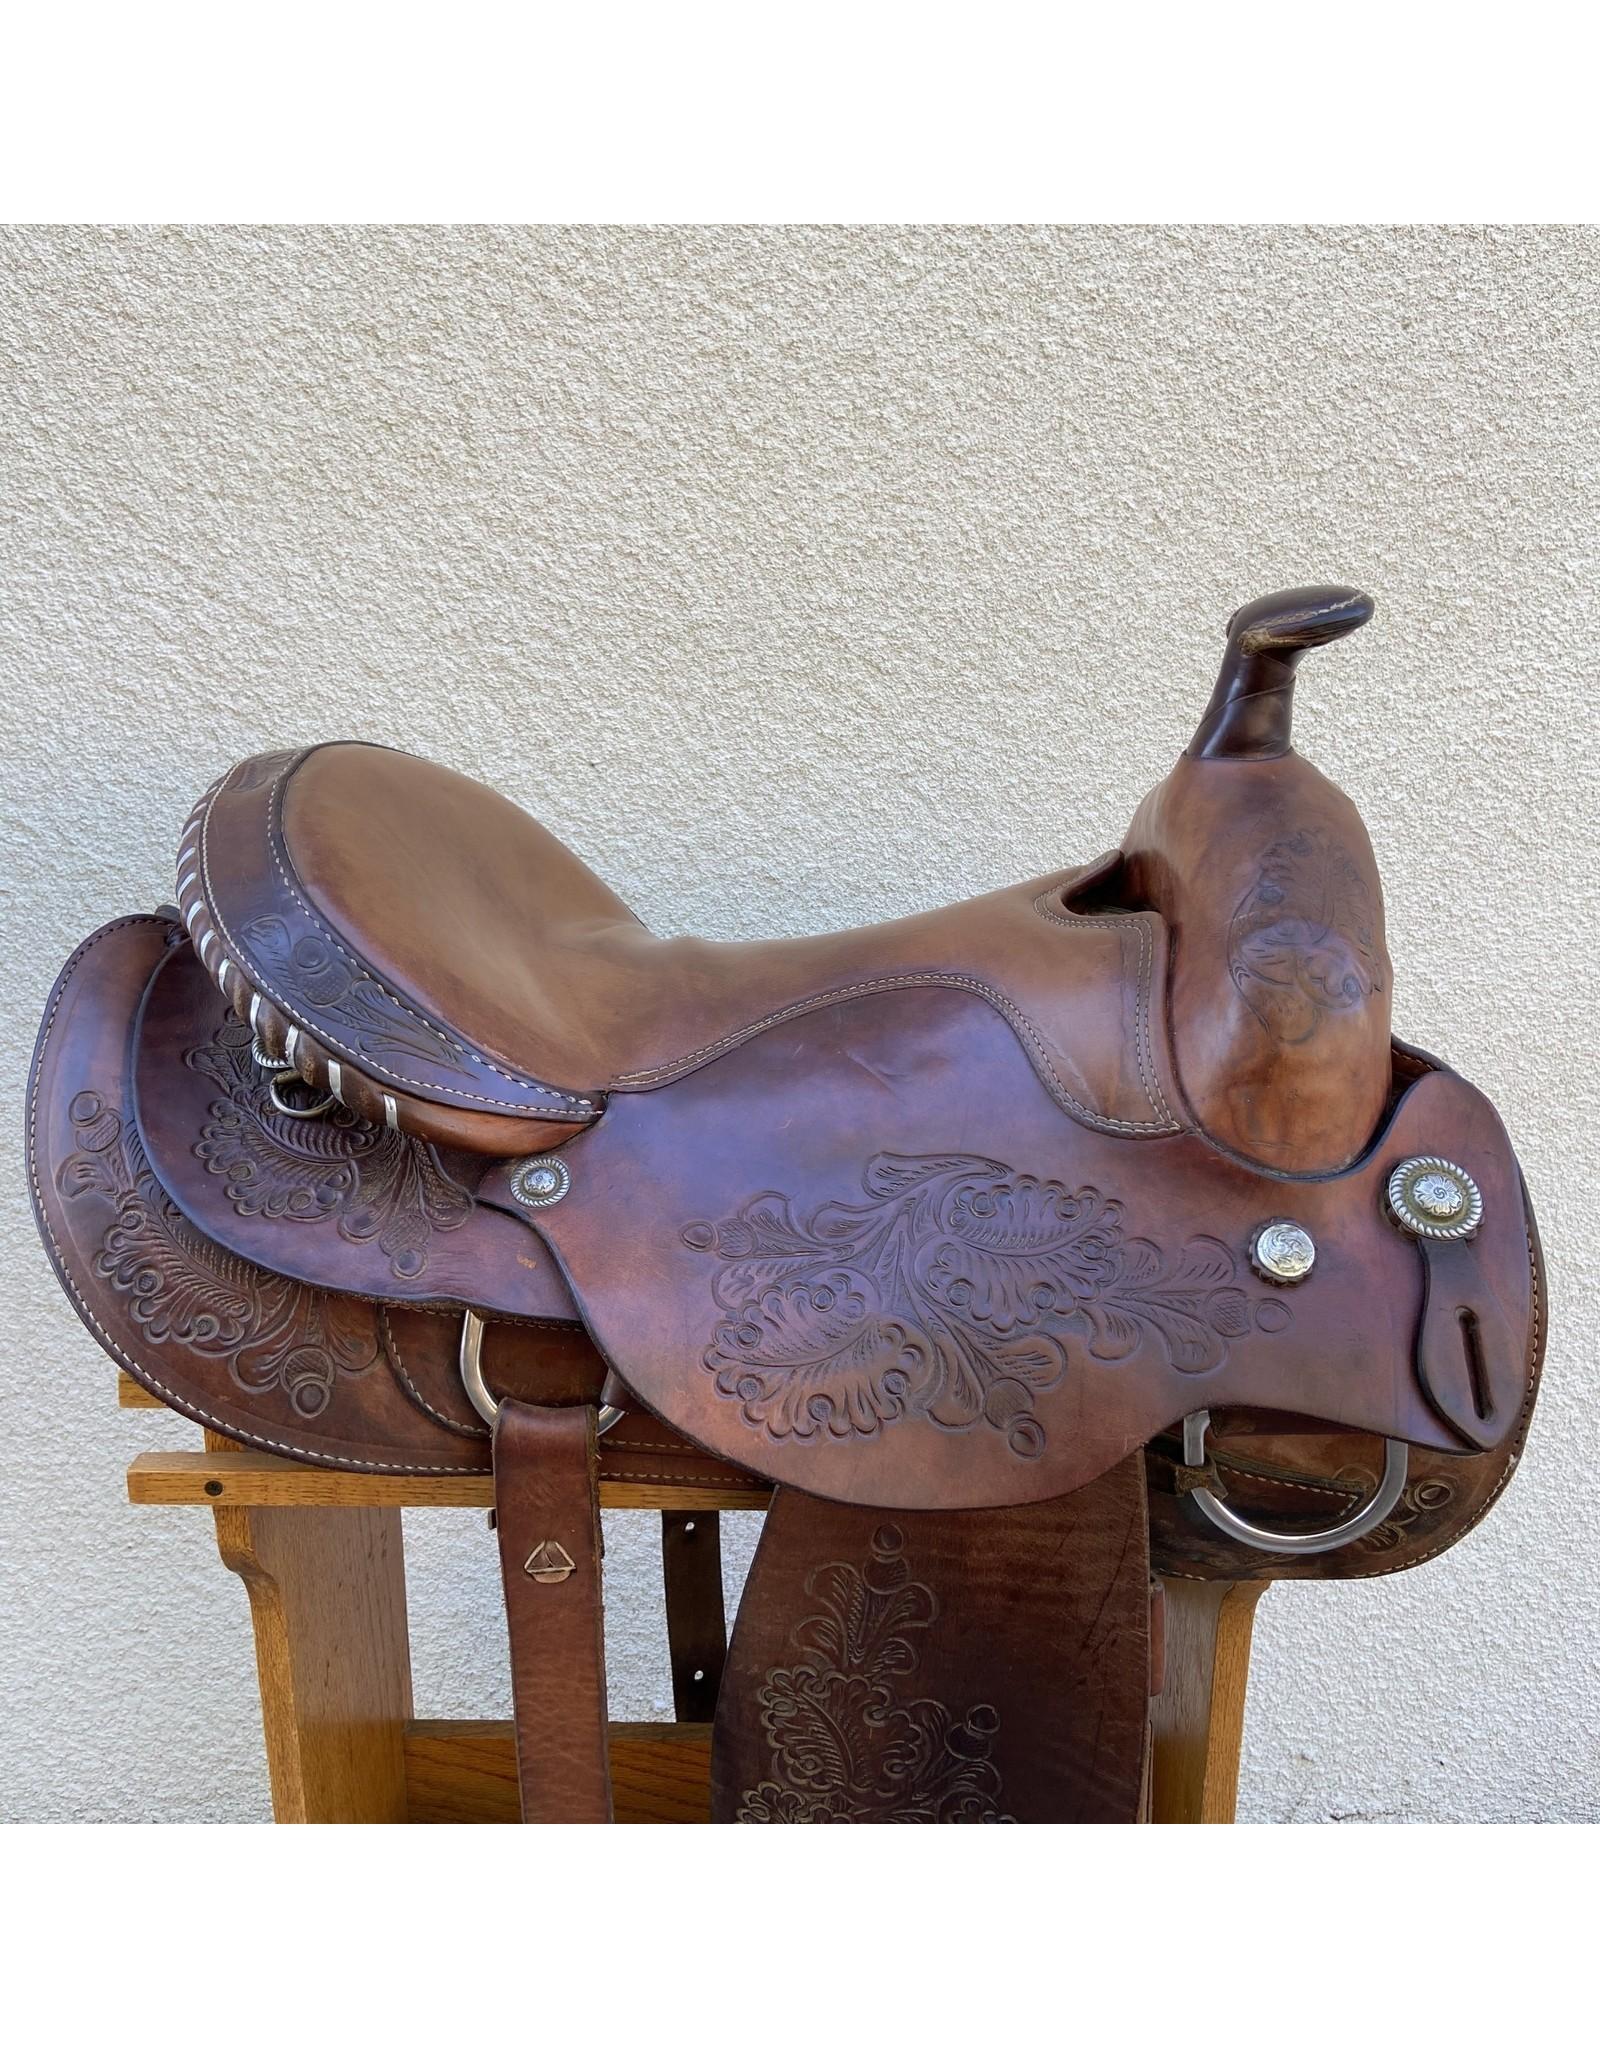 "*FOR DISPLAY ONLY* Ballard 18"" Western Saddle"